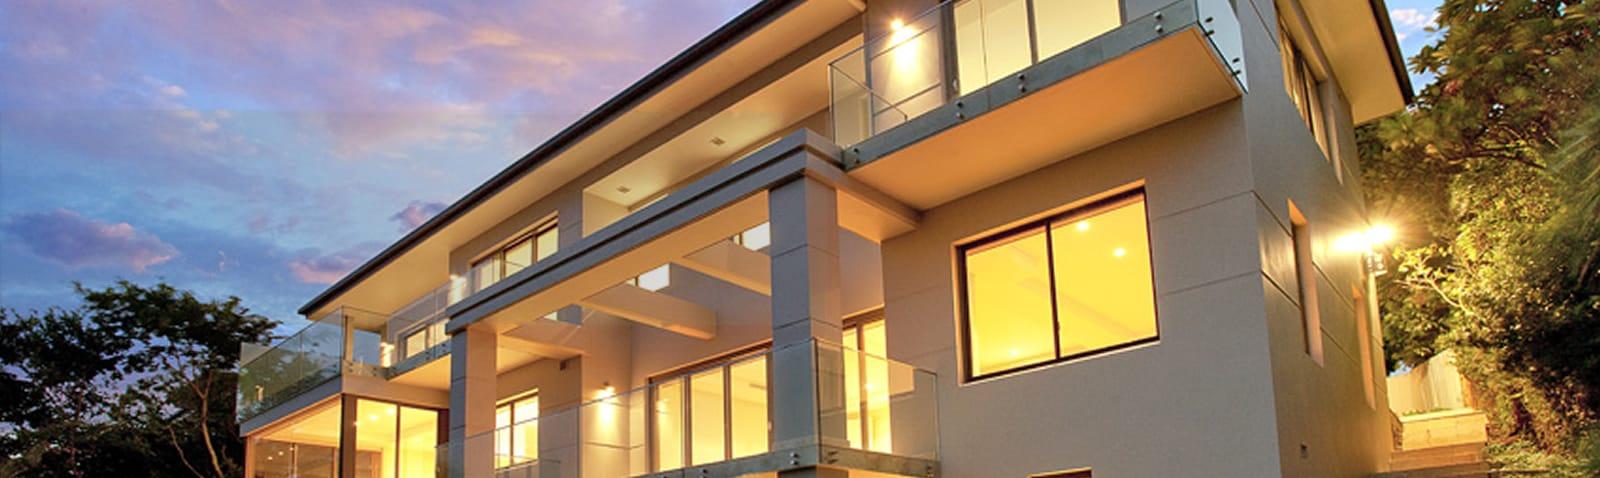 property-investment-sydney-australia-sfi